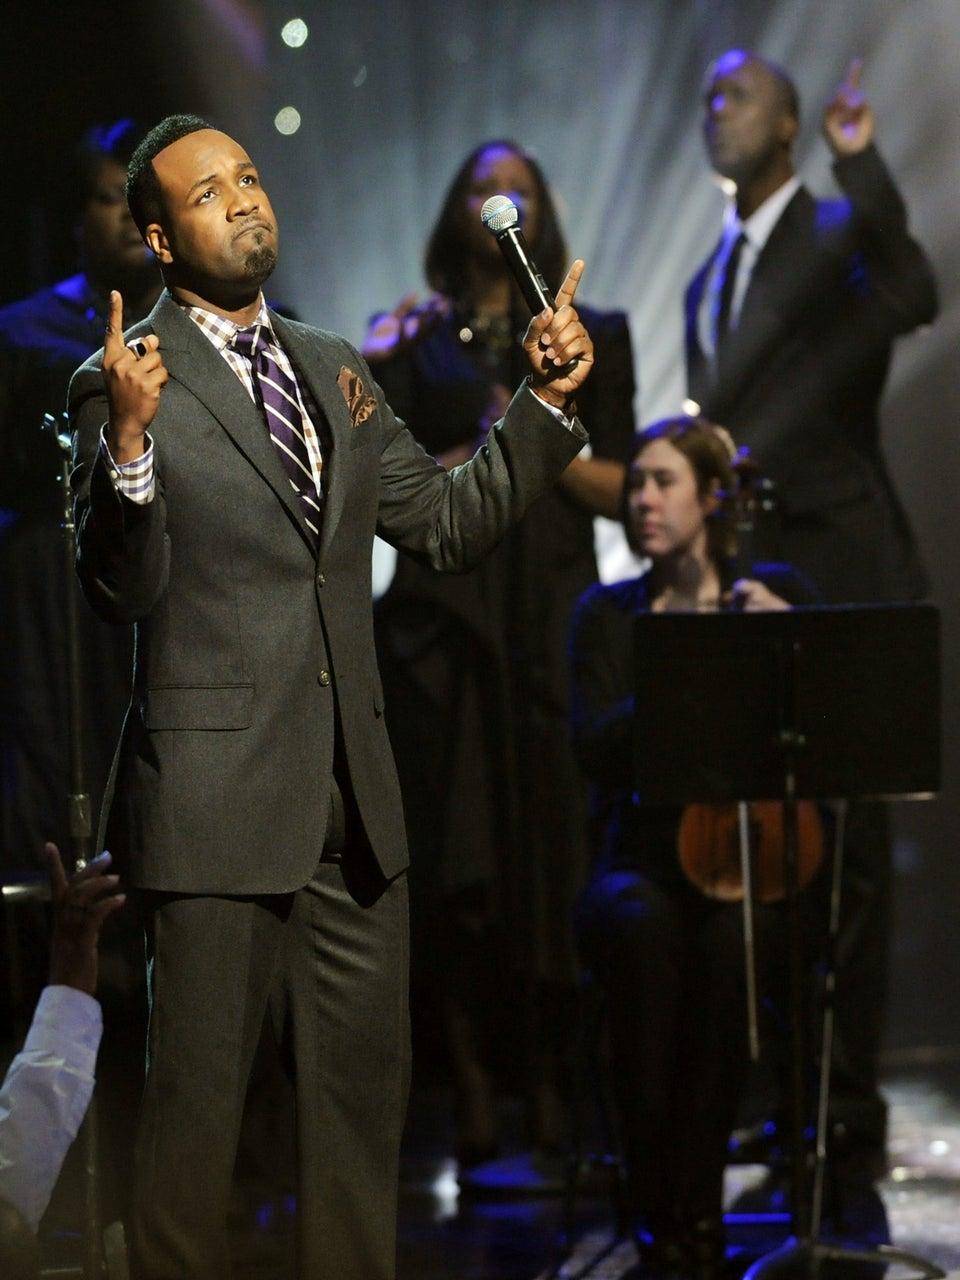 Gospel Star VaShawn Mitchell on Being 'Fatherless, But Triumphant'